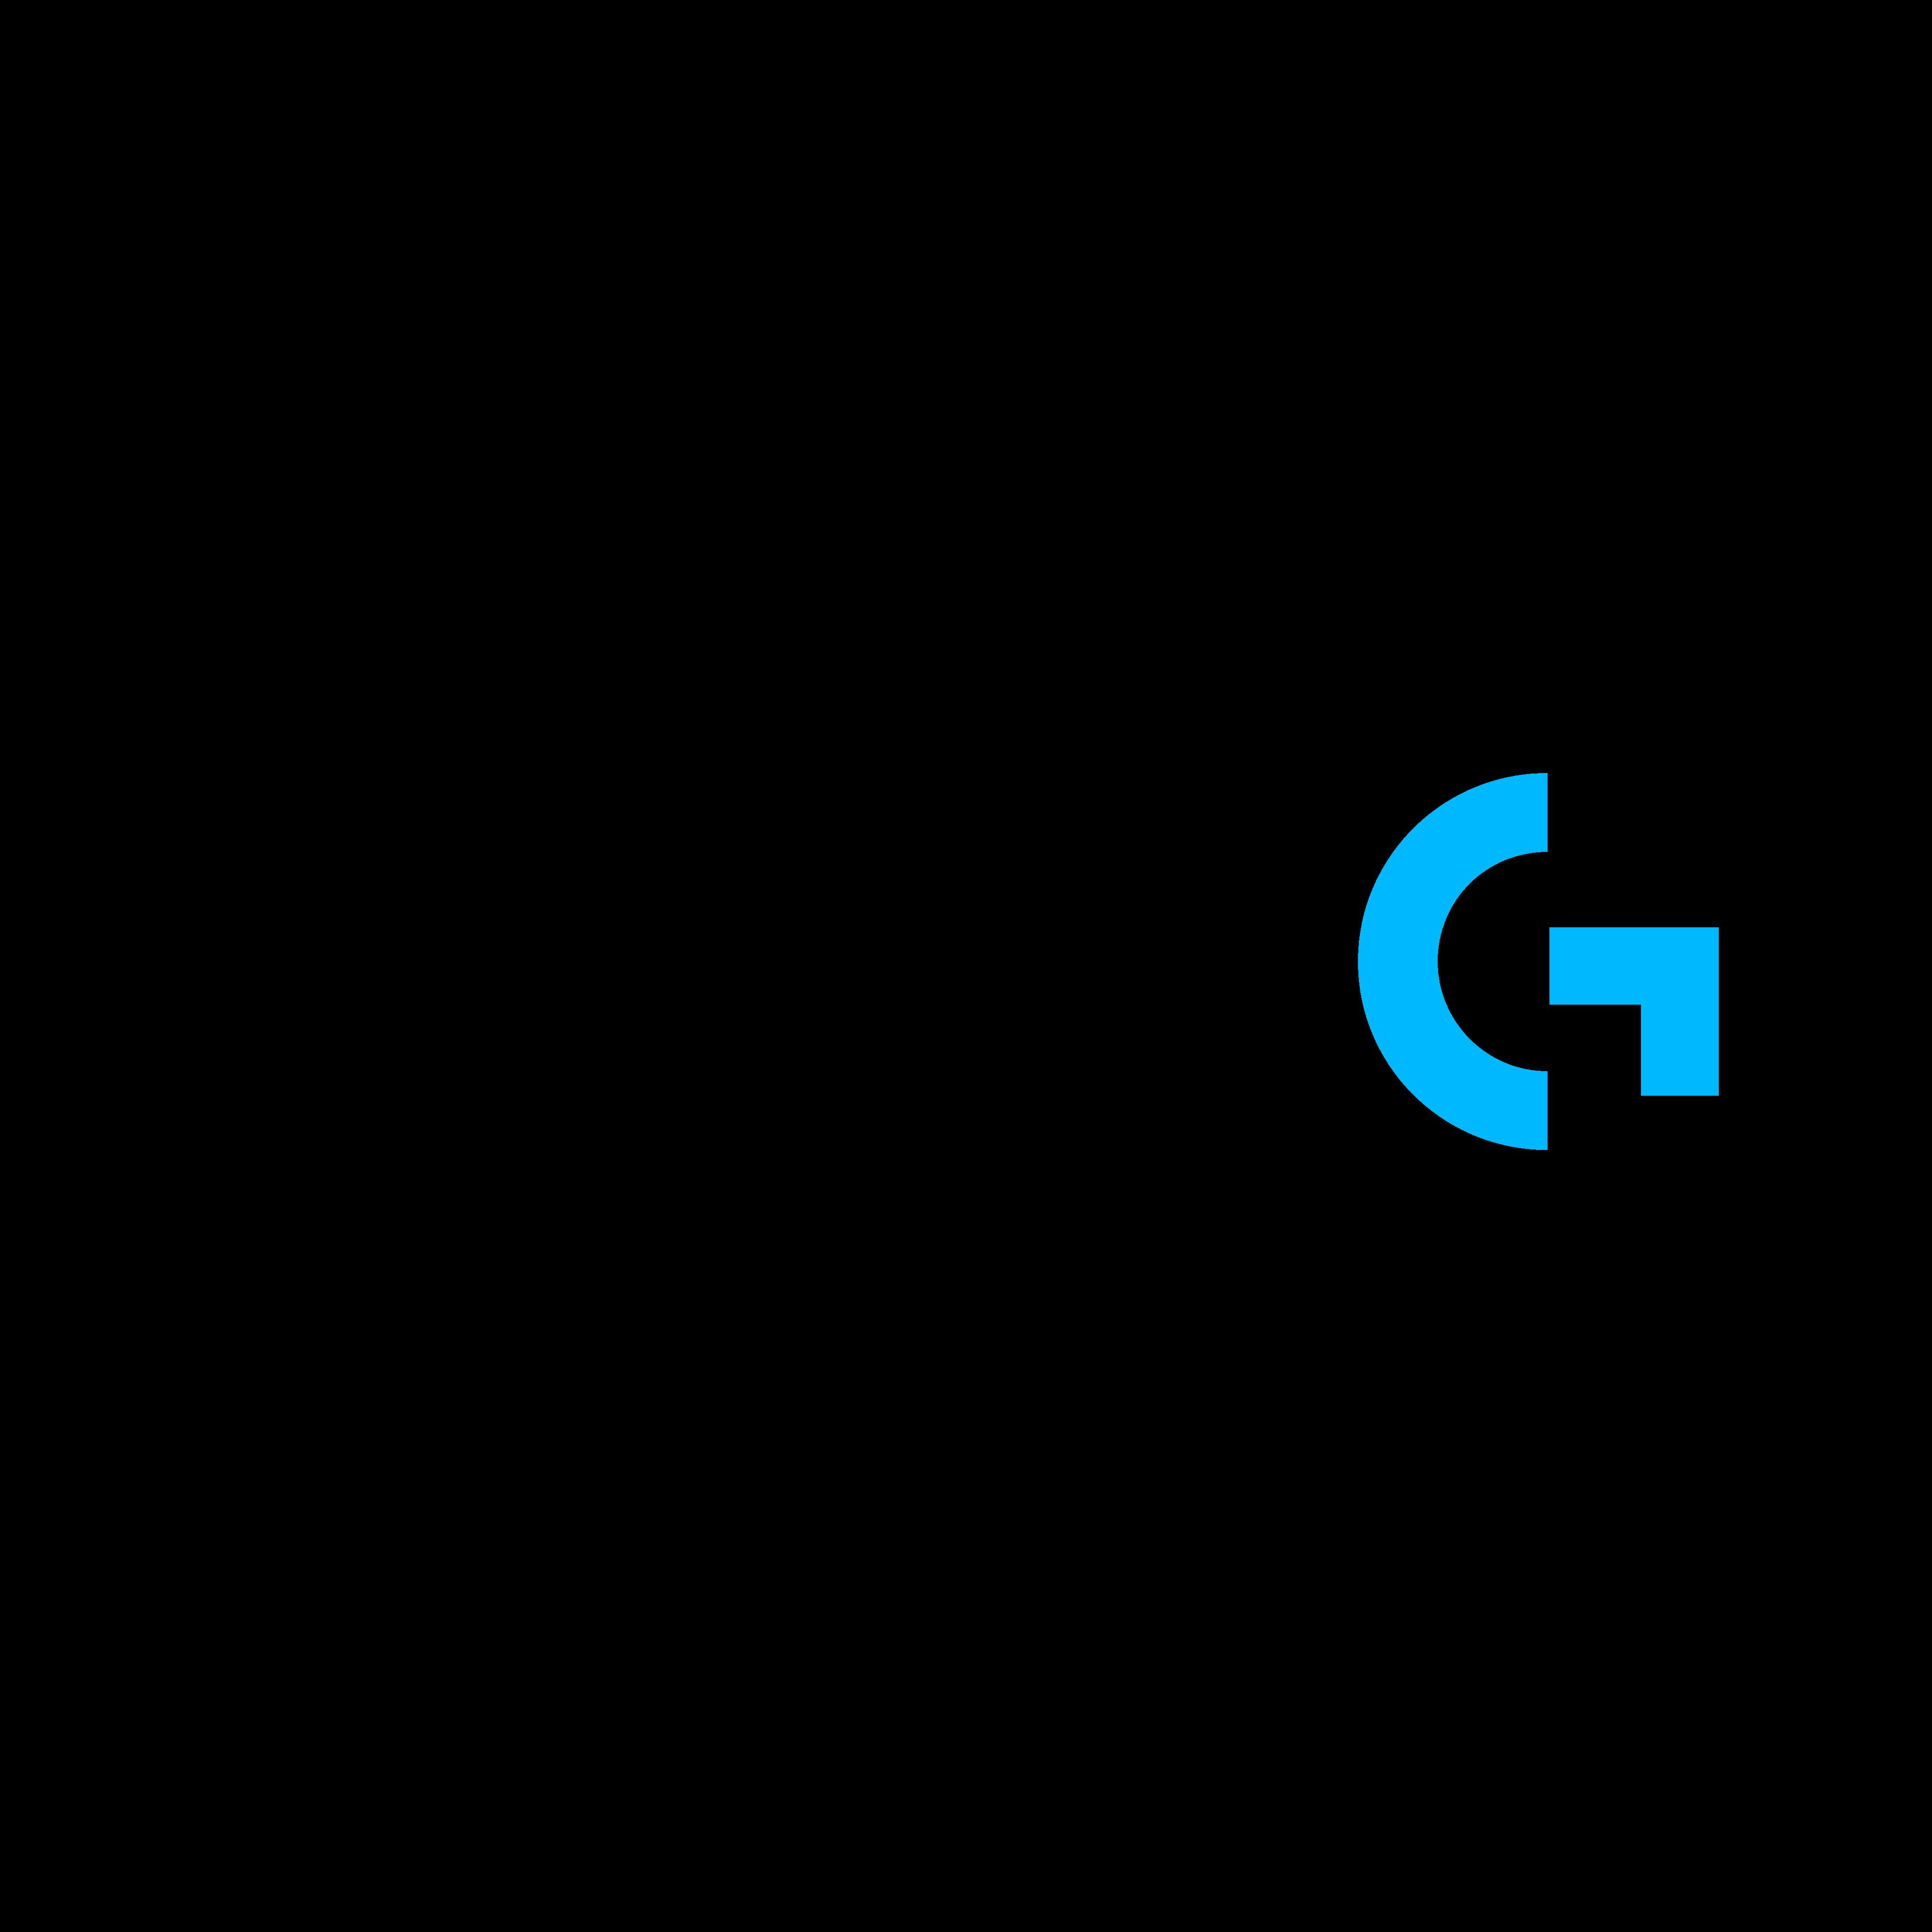 logitech logo 24 - Logitech Logo